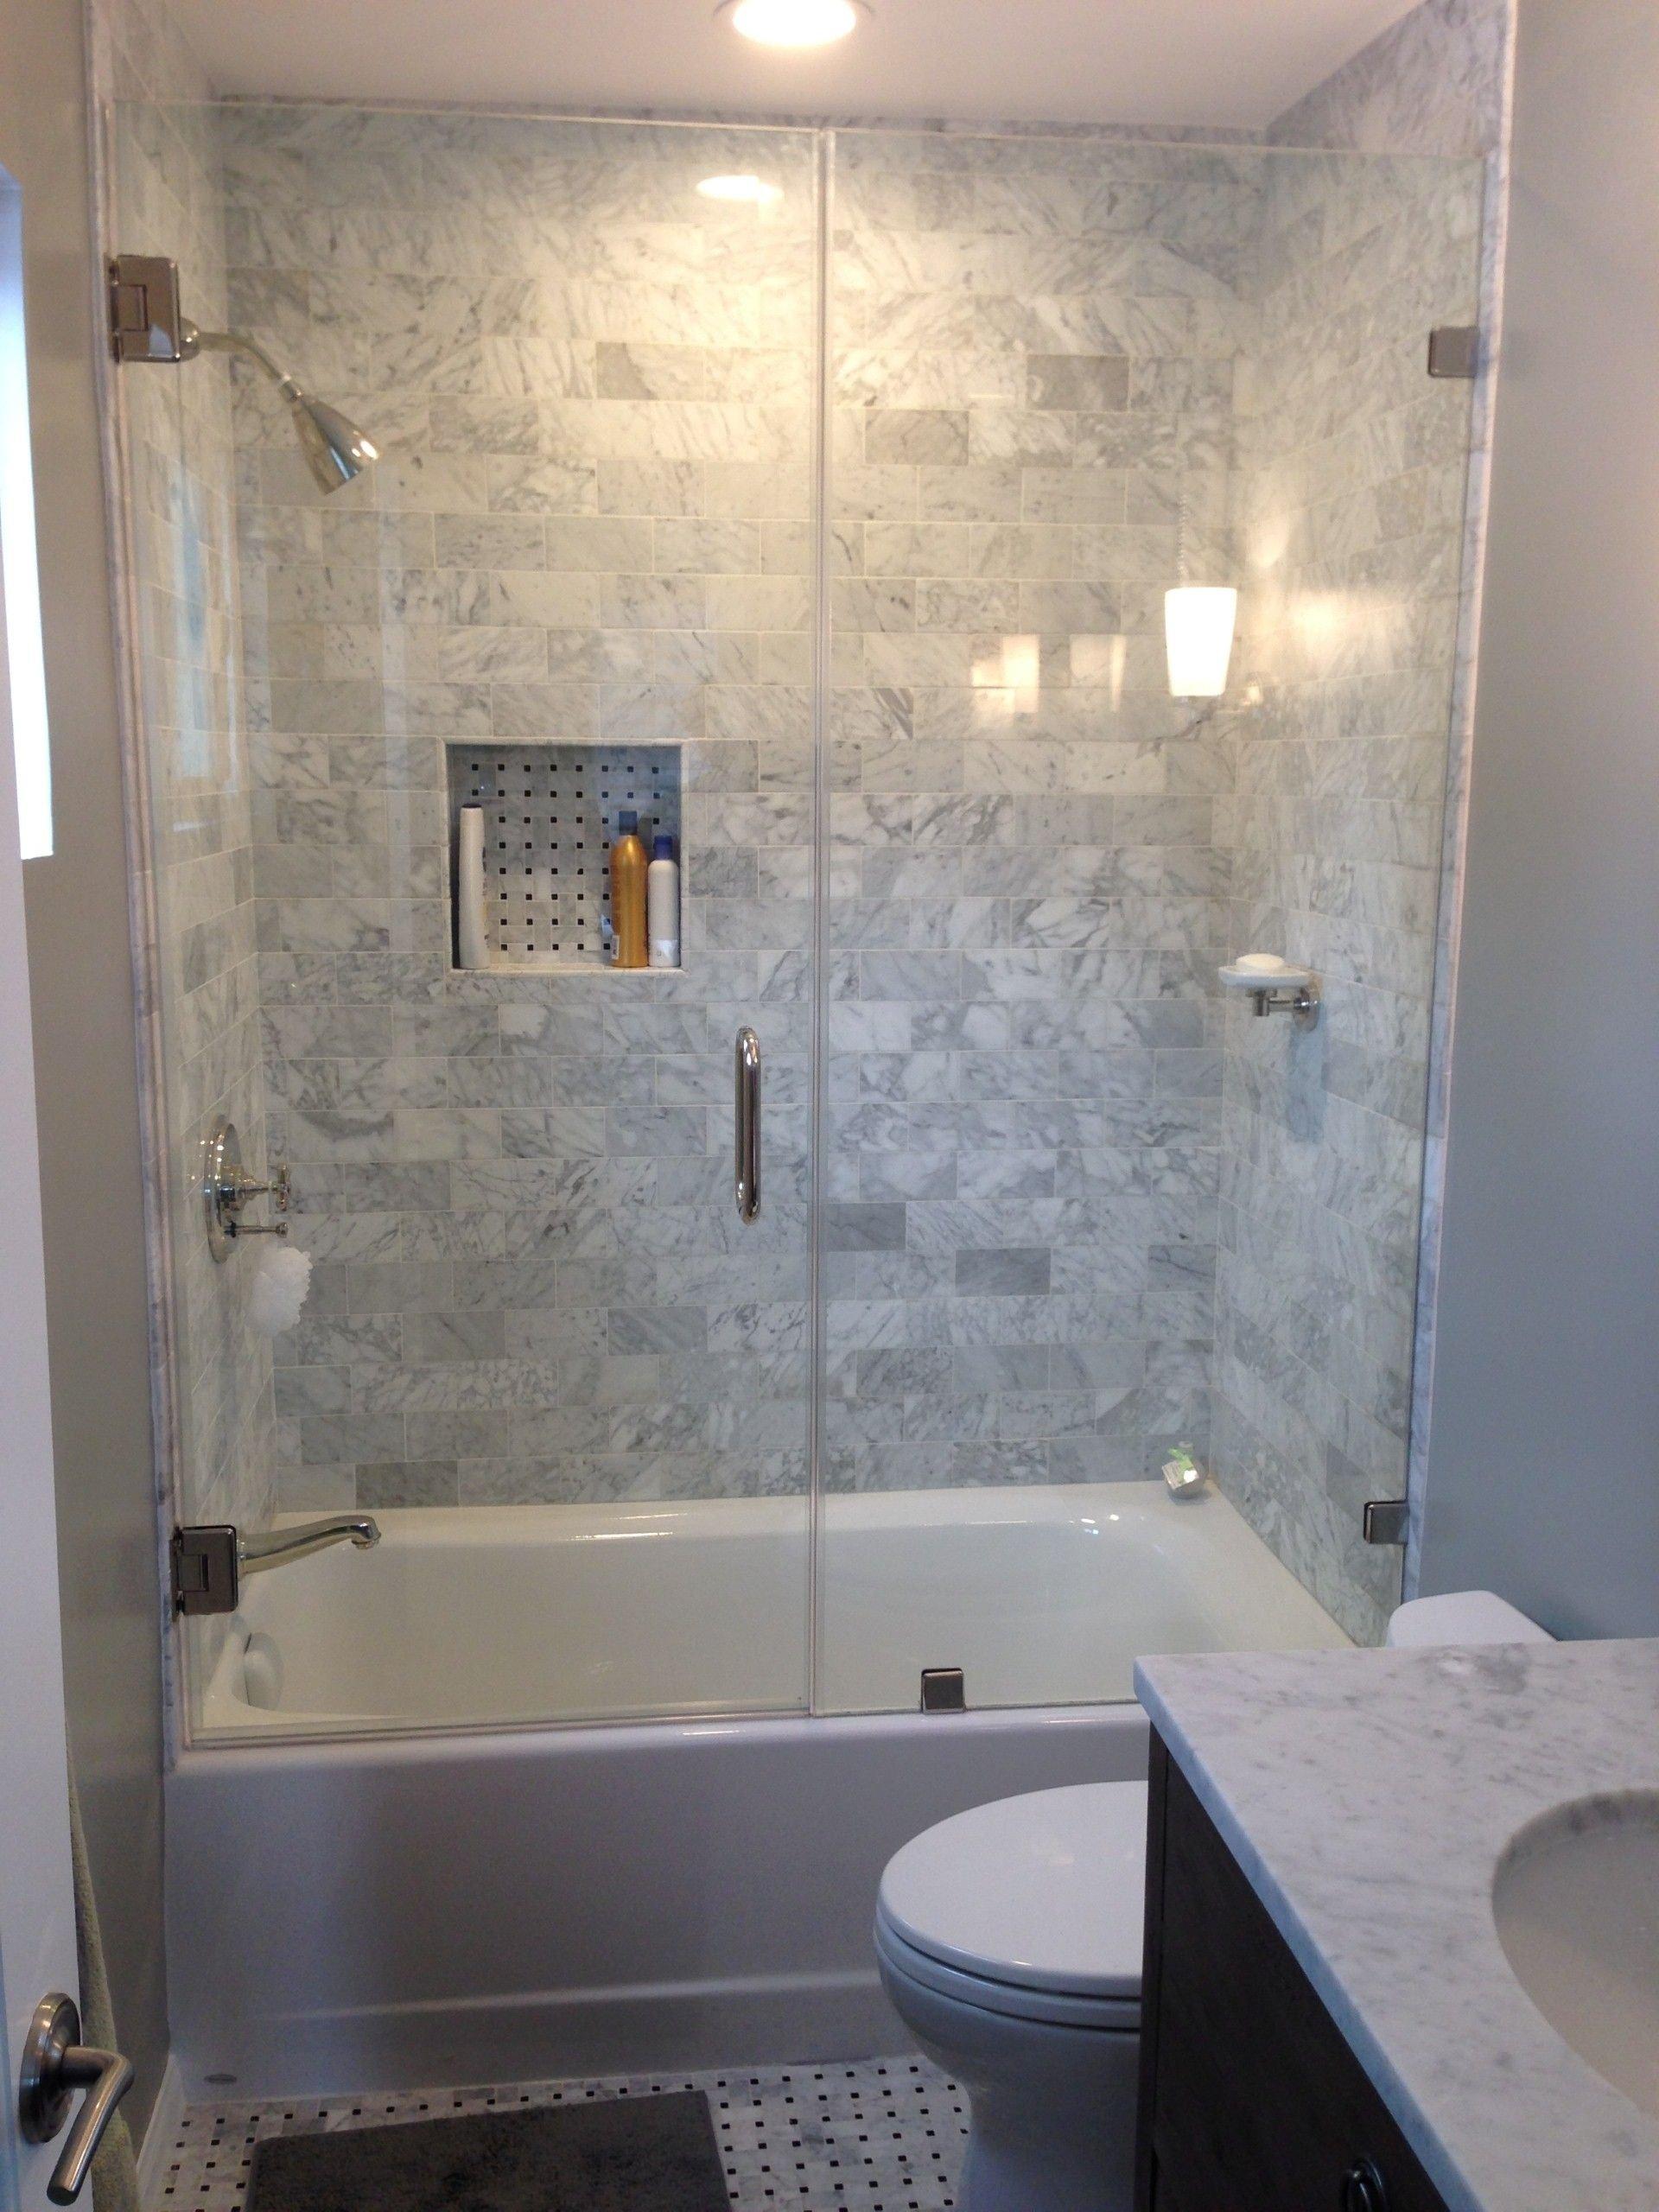 10 Pretty Bathroom Ideas For Small Bathroom extraordinary small bathroom designs with tub vie decor simple